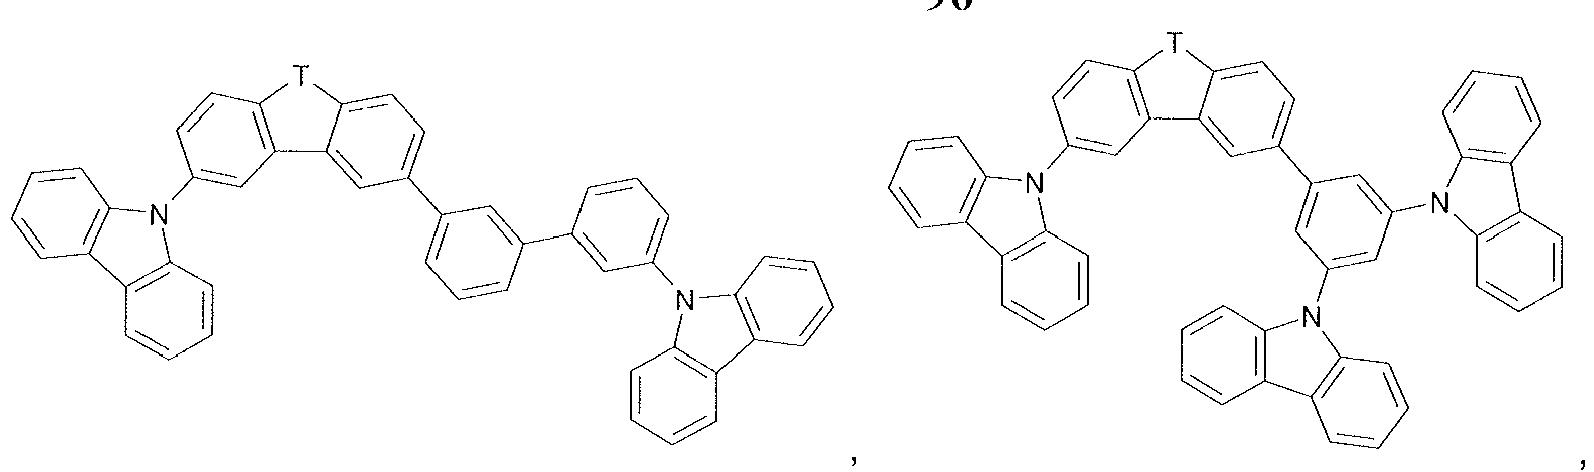 Figure imgb0685